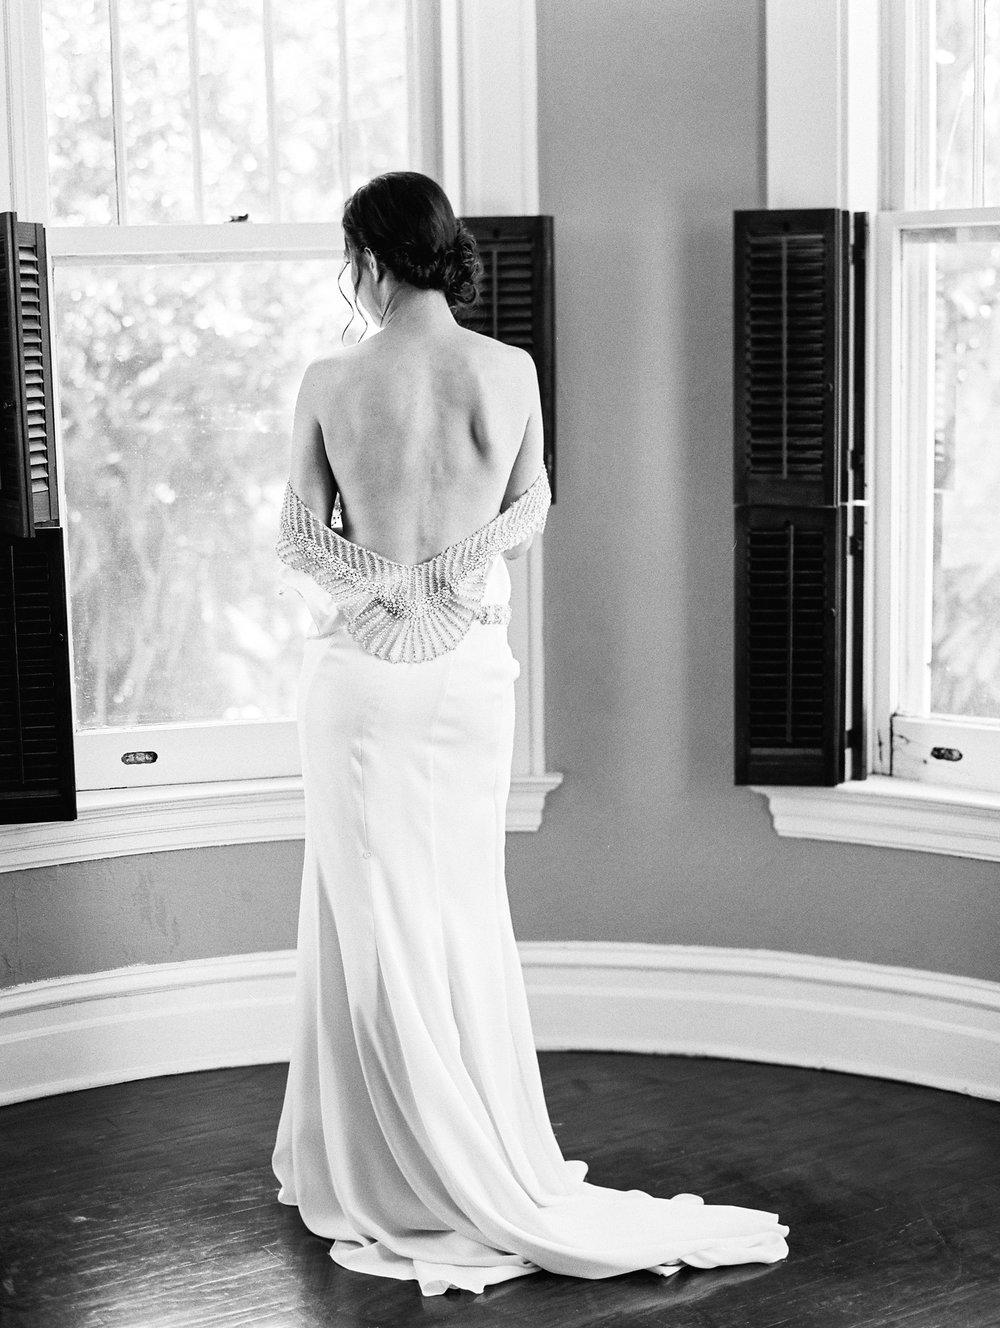 naples_florida_fine_art_wedding_photographer_shannon_griffin_0098.jpg